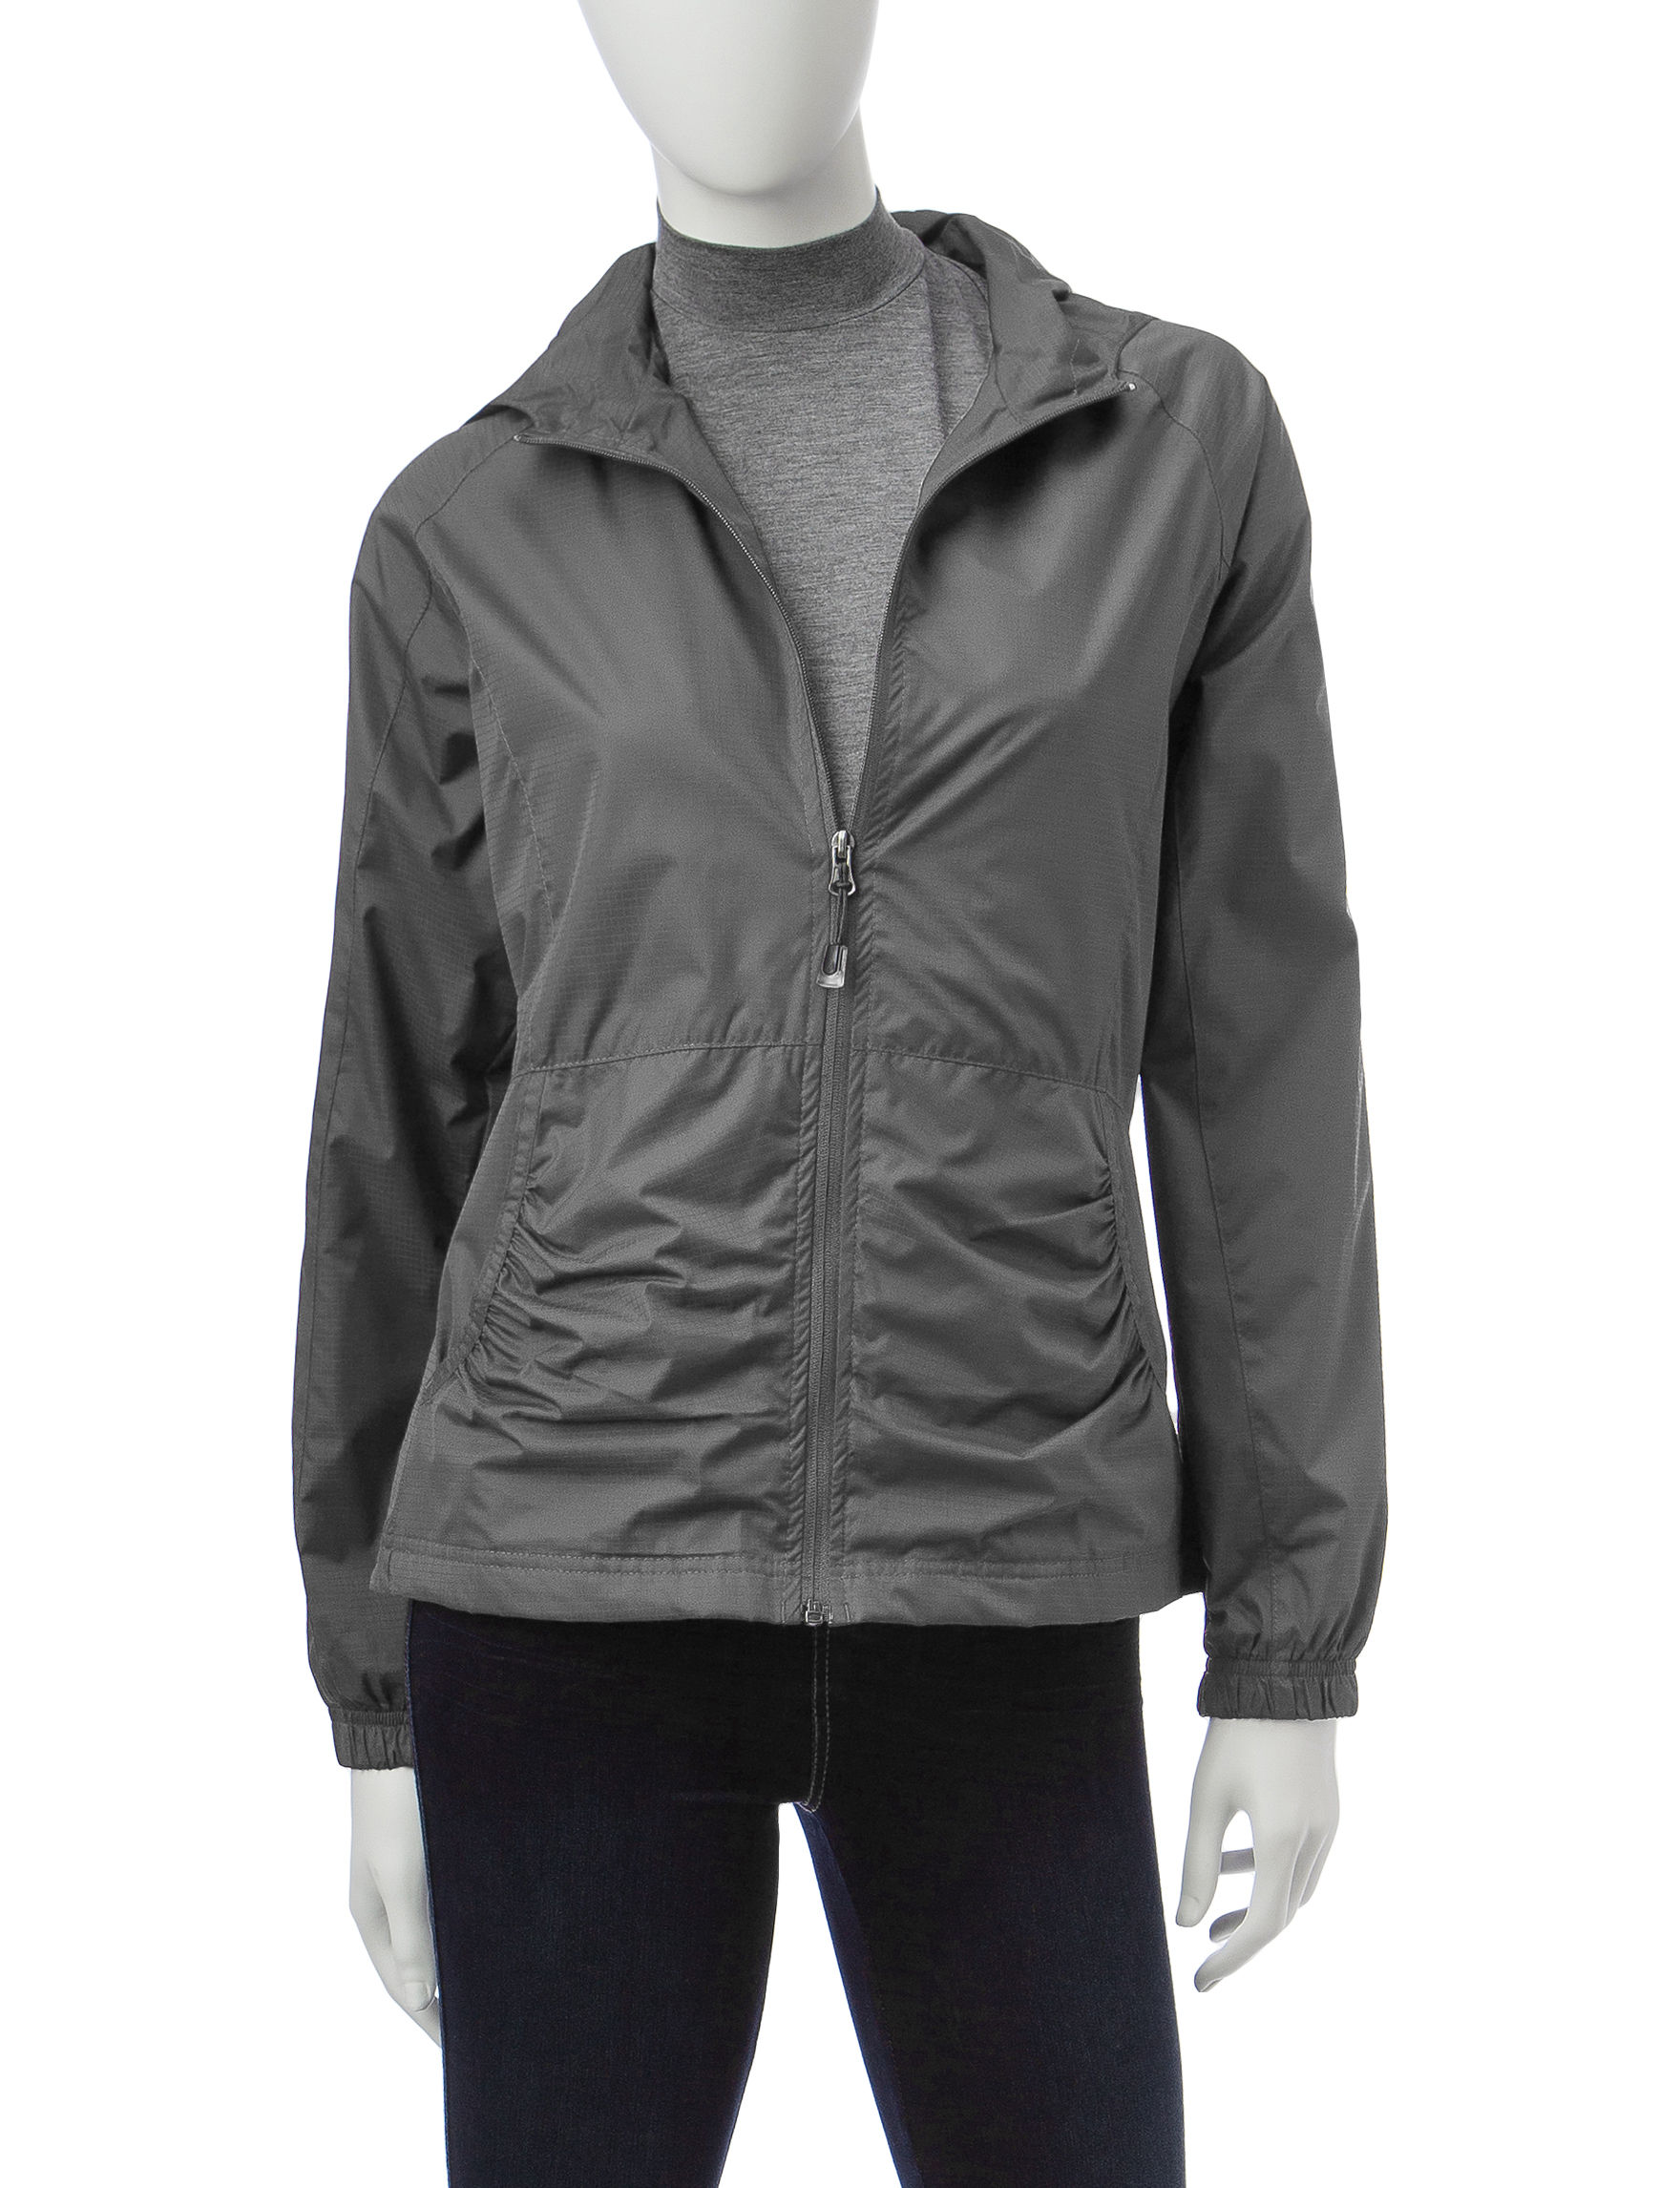 Hannah Grey Lightweight Jackets & Blazers Rain & Snow Jackets